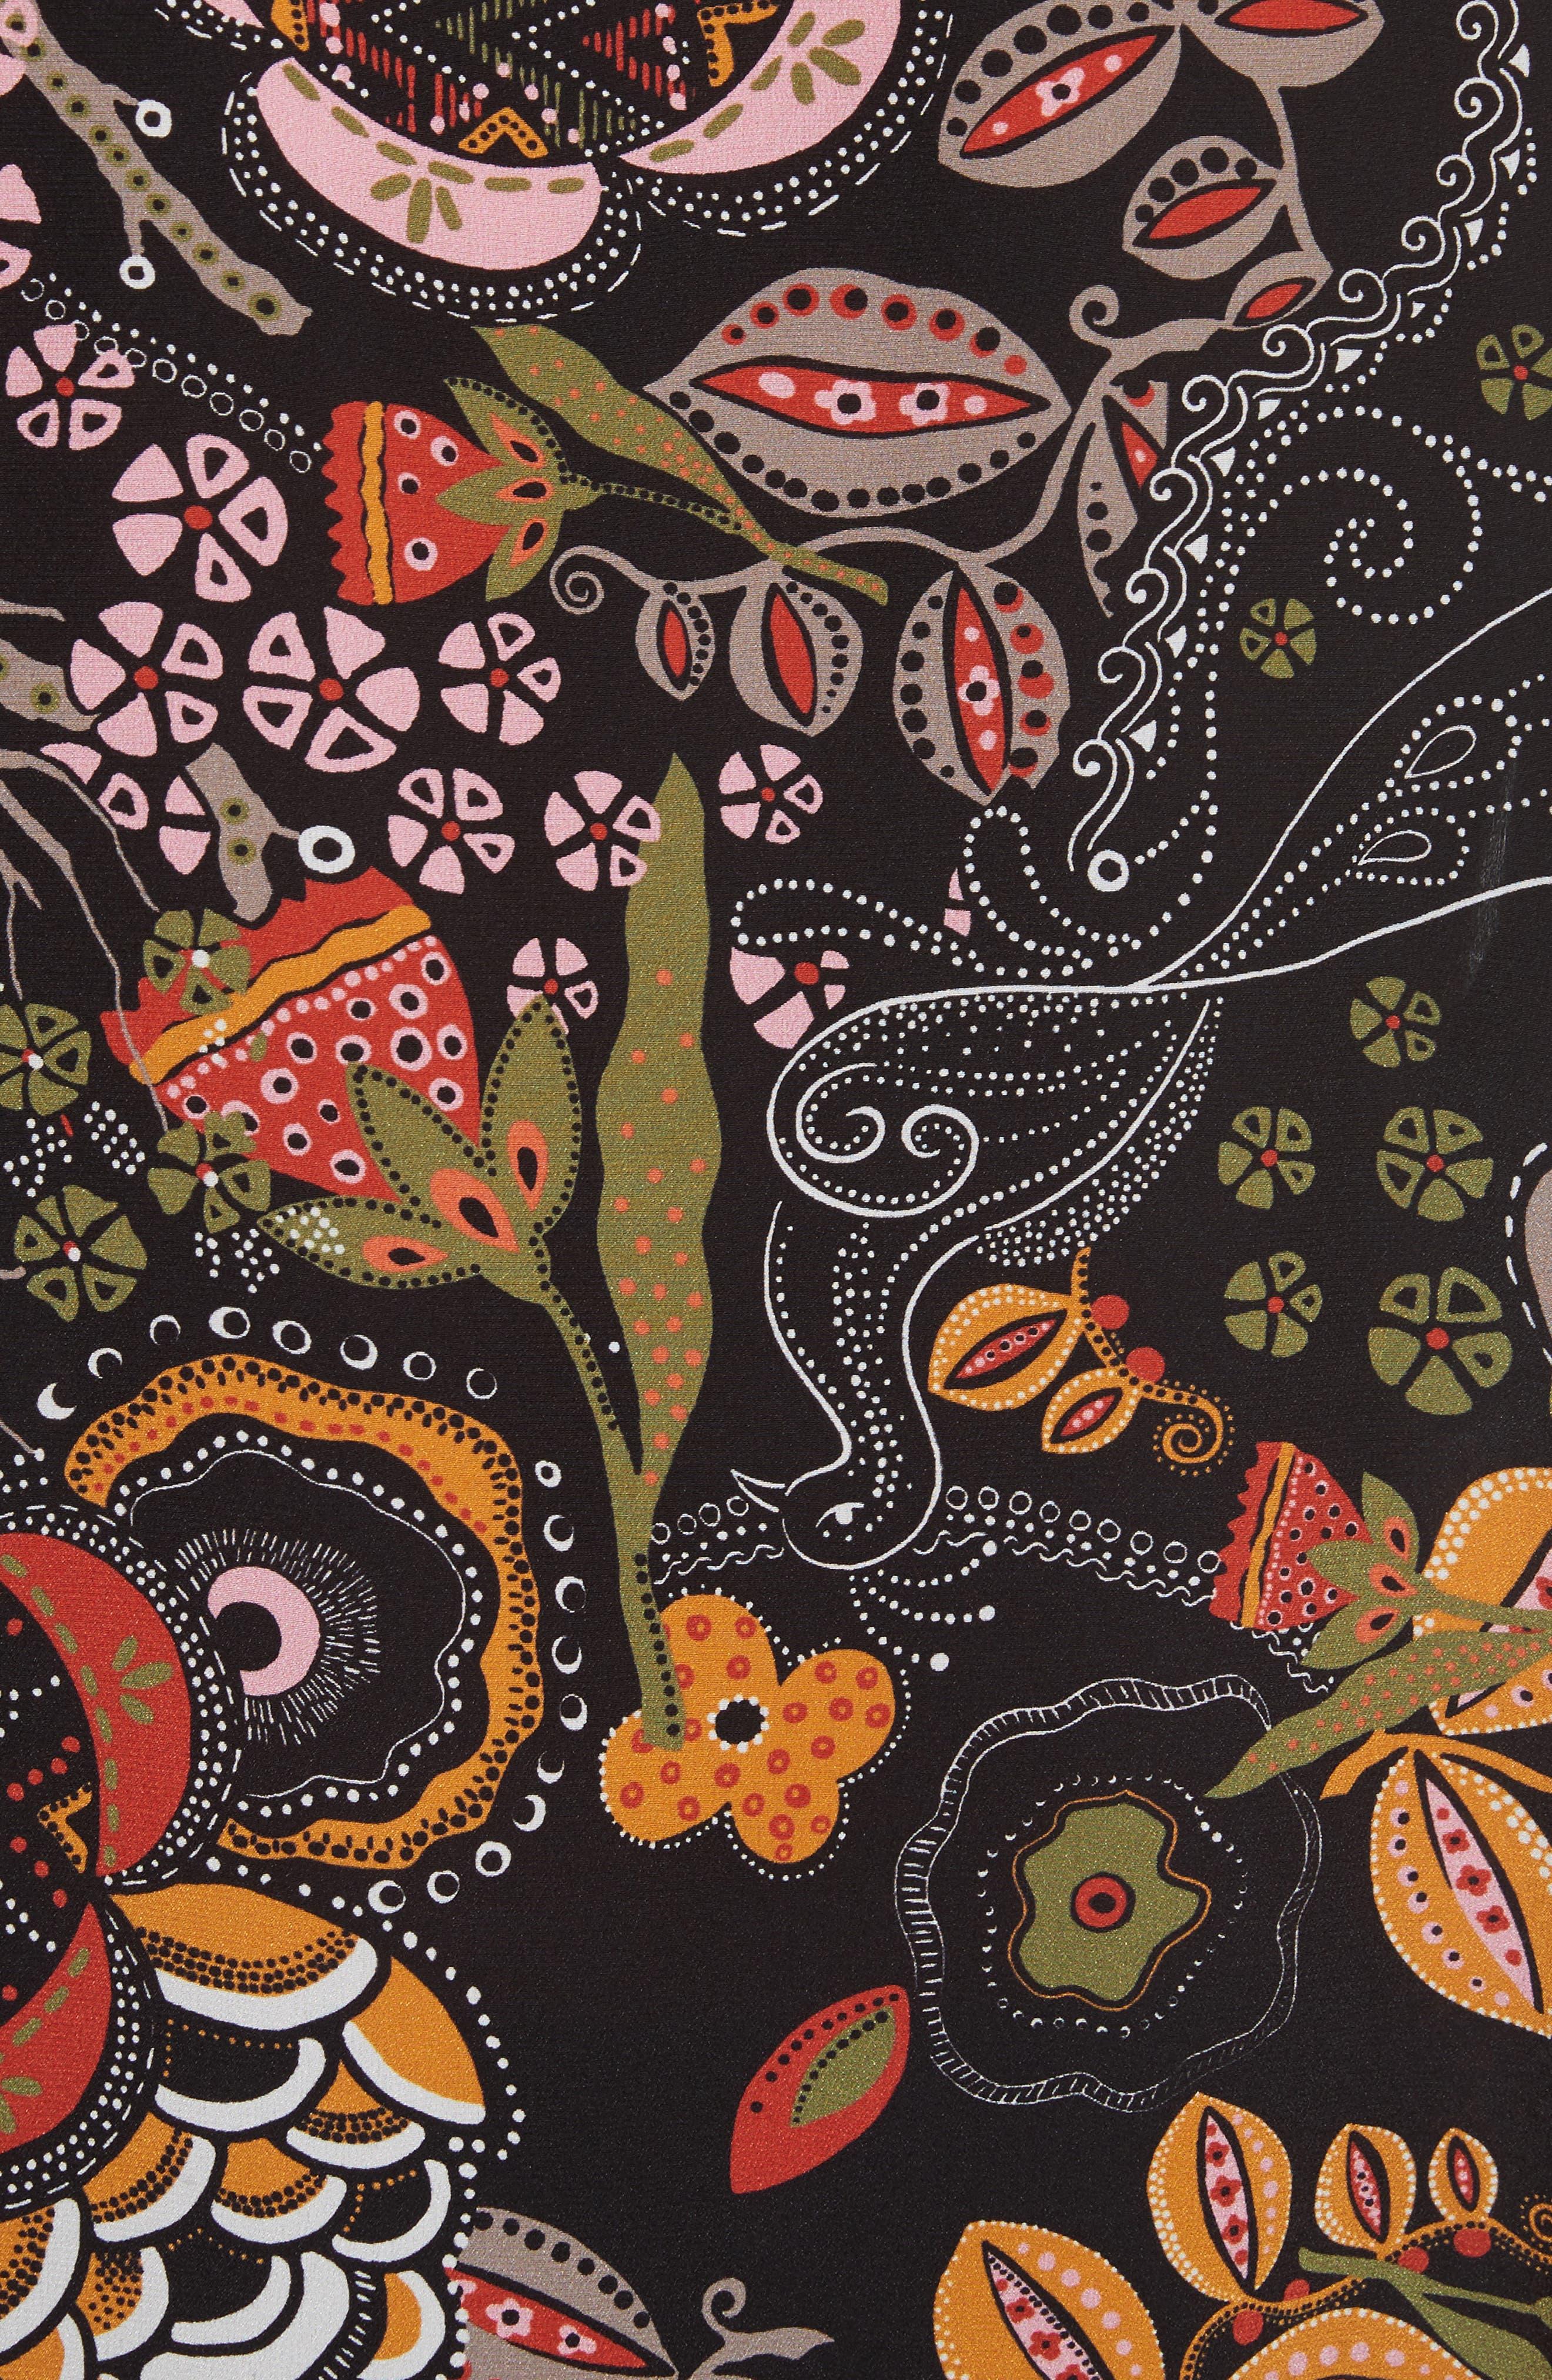 Zigzag Floral Silk Top,                             Alternate thumbnail 5, color,                             001